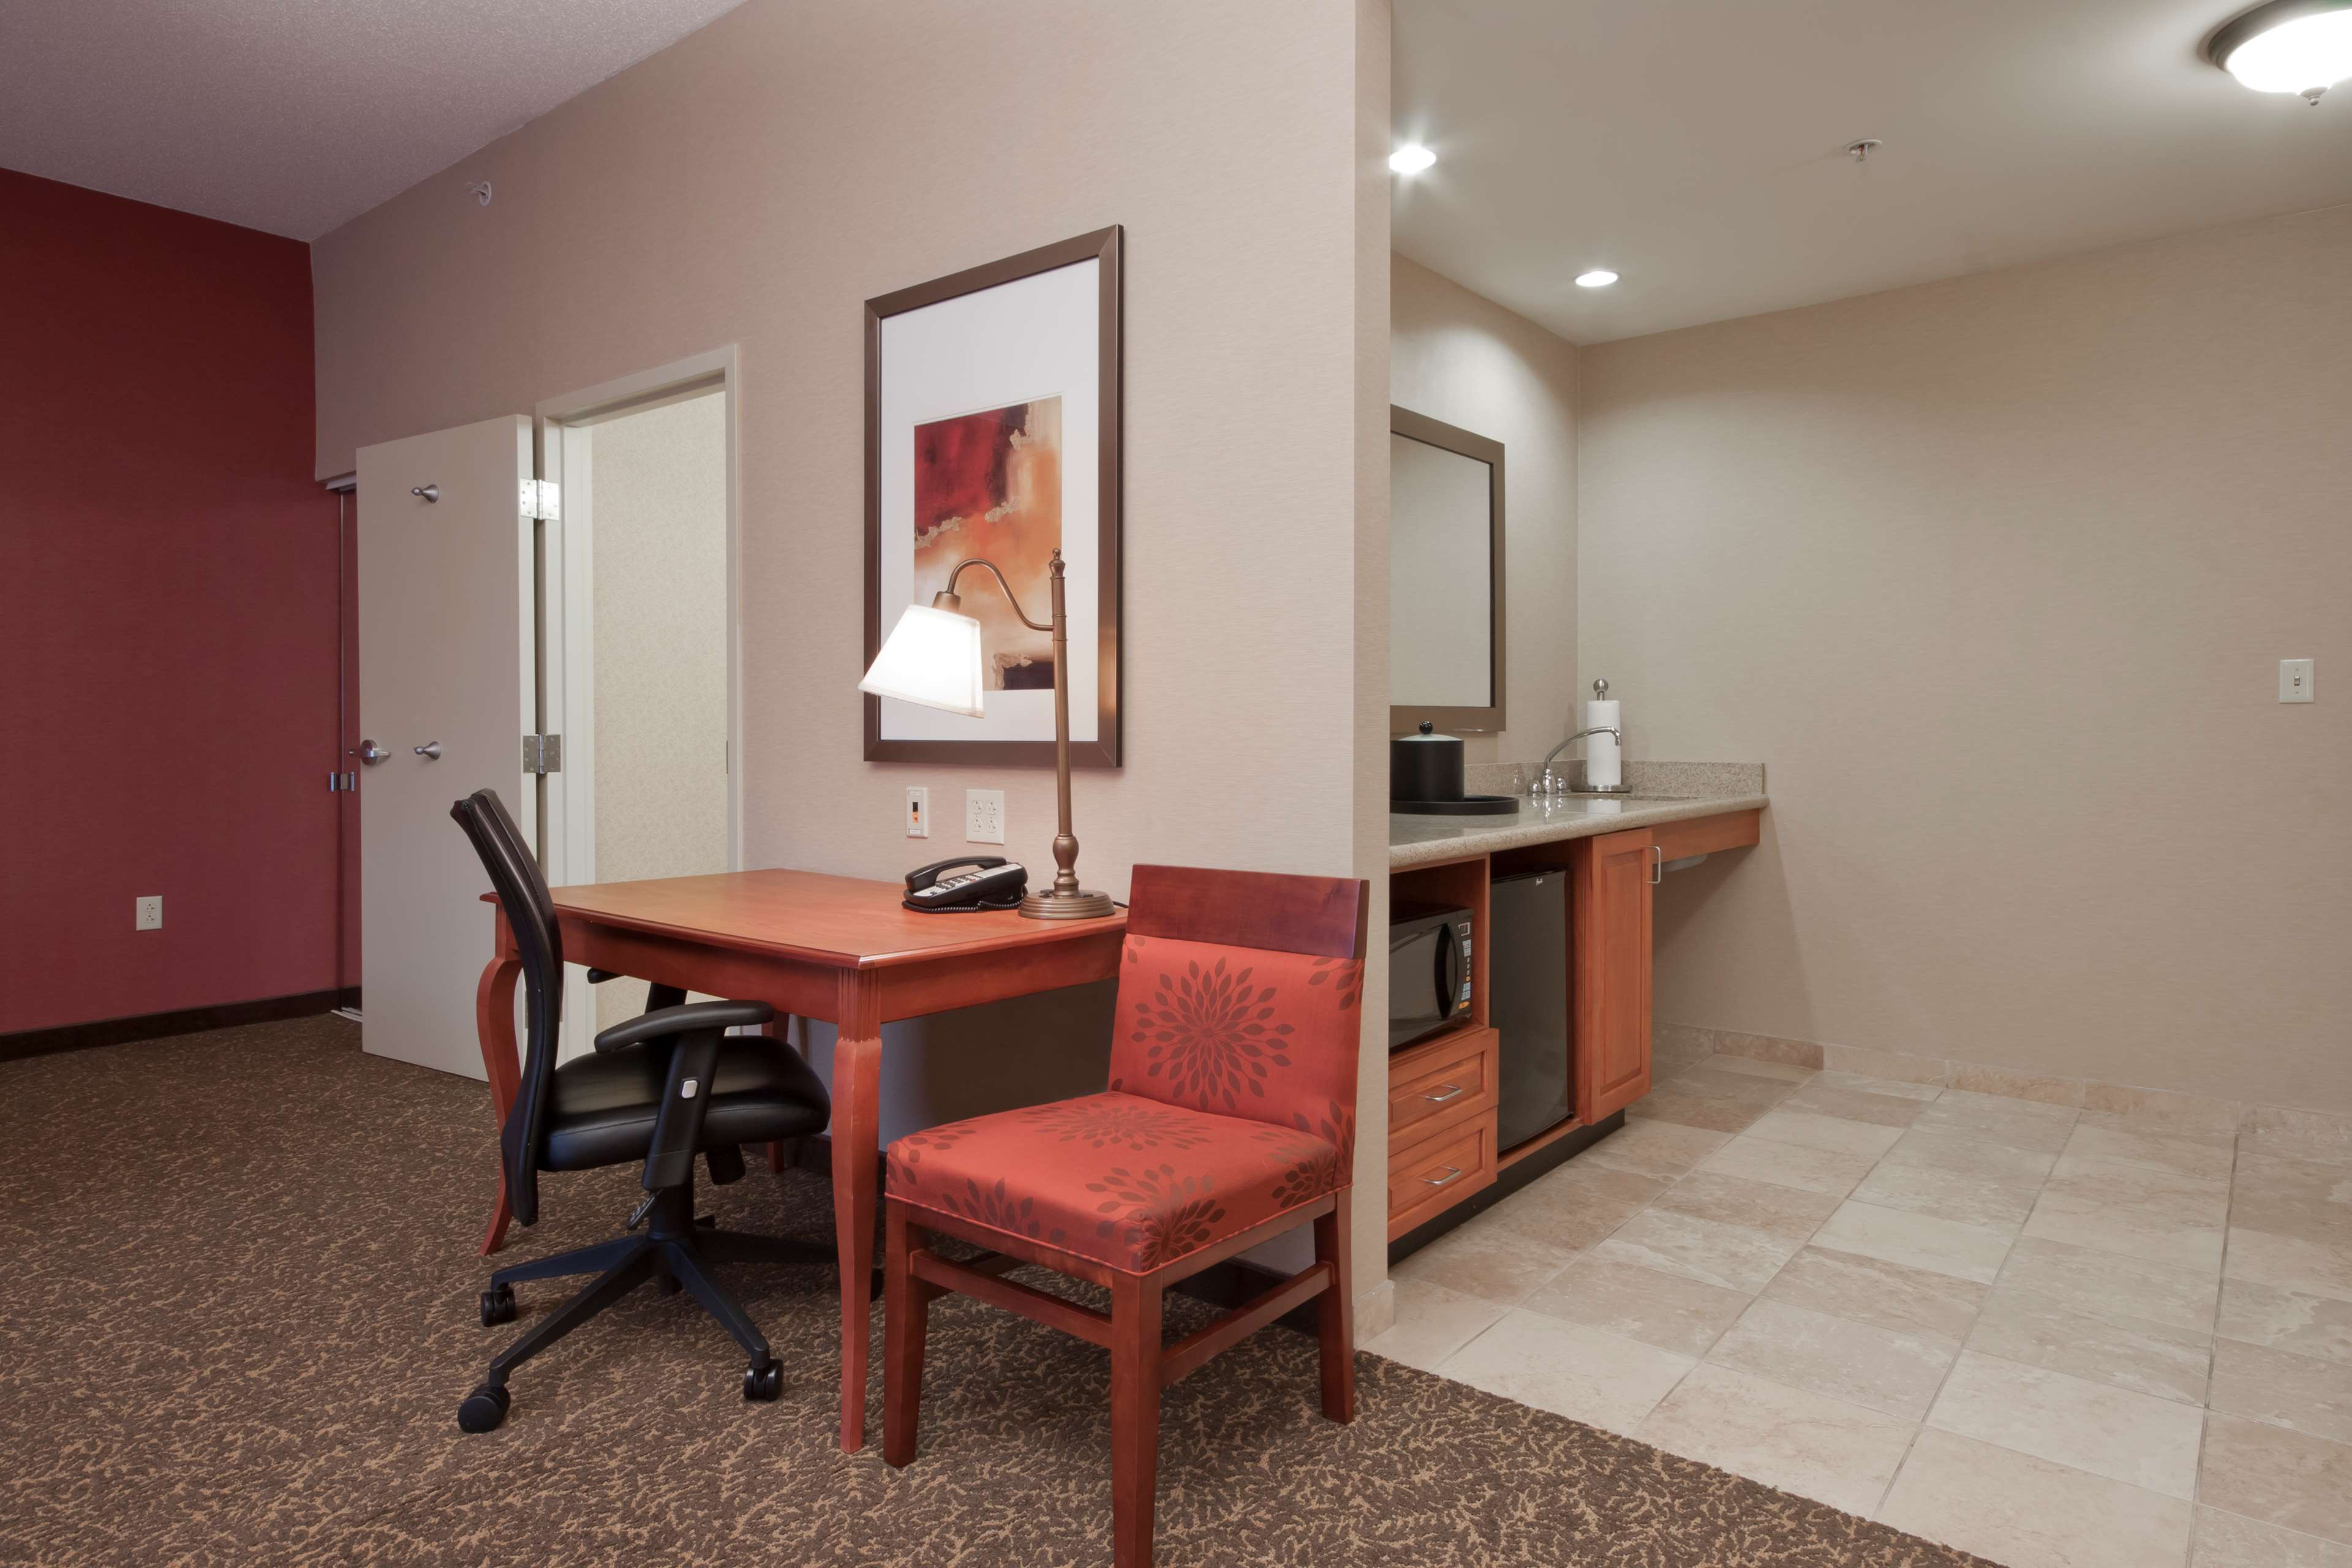 Hampton Inn & Suites Pittsburgh-Downtown image 20